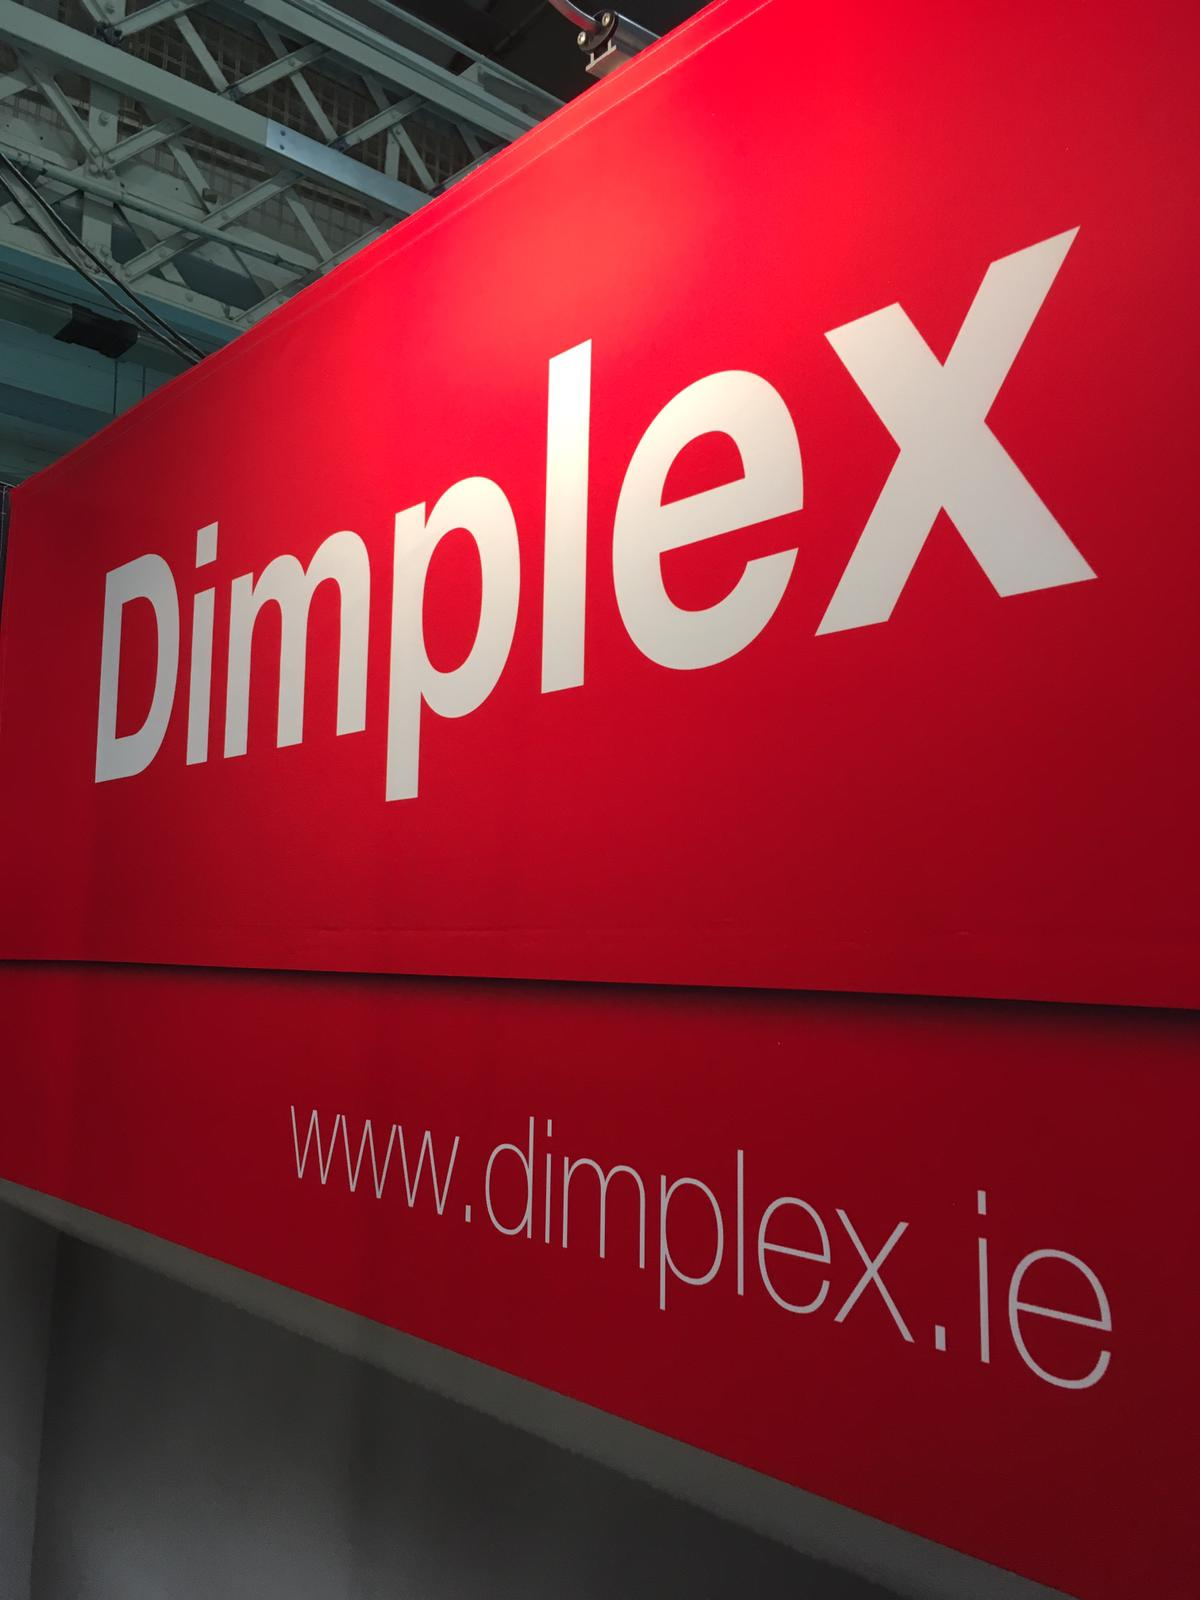 Glen Dimplex Ireland headline image